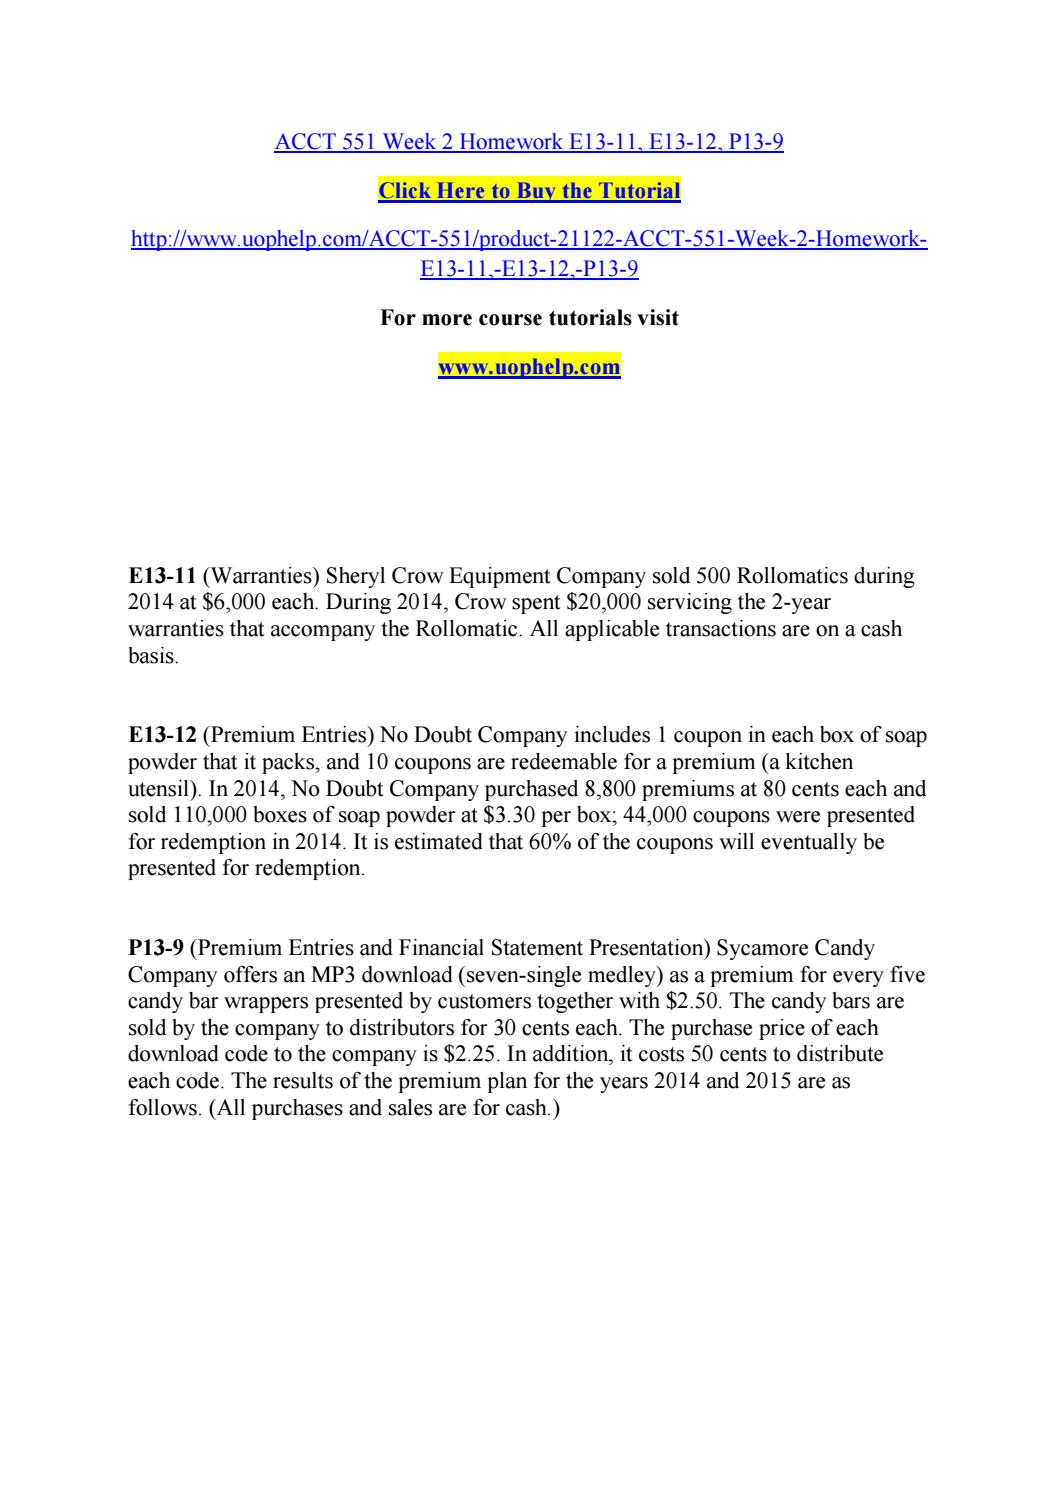 sheryl crow equipment company sold 500 rollomatics dur Answer to e13-11 (warranties) sheryl crow equipment company sold 500 rollomatics during 2014 at $6,000 each during 2014, crow spe.